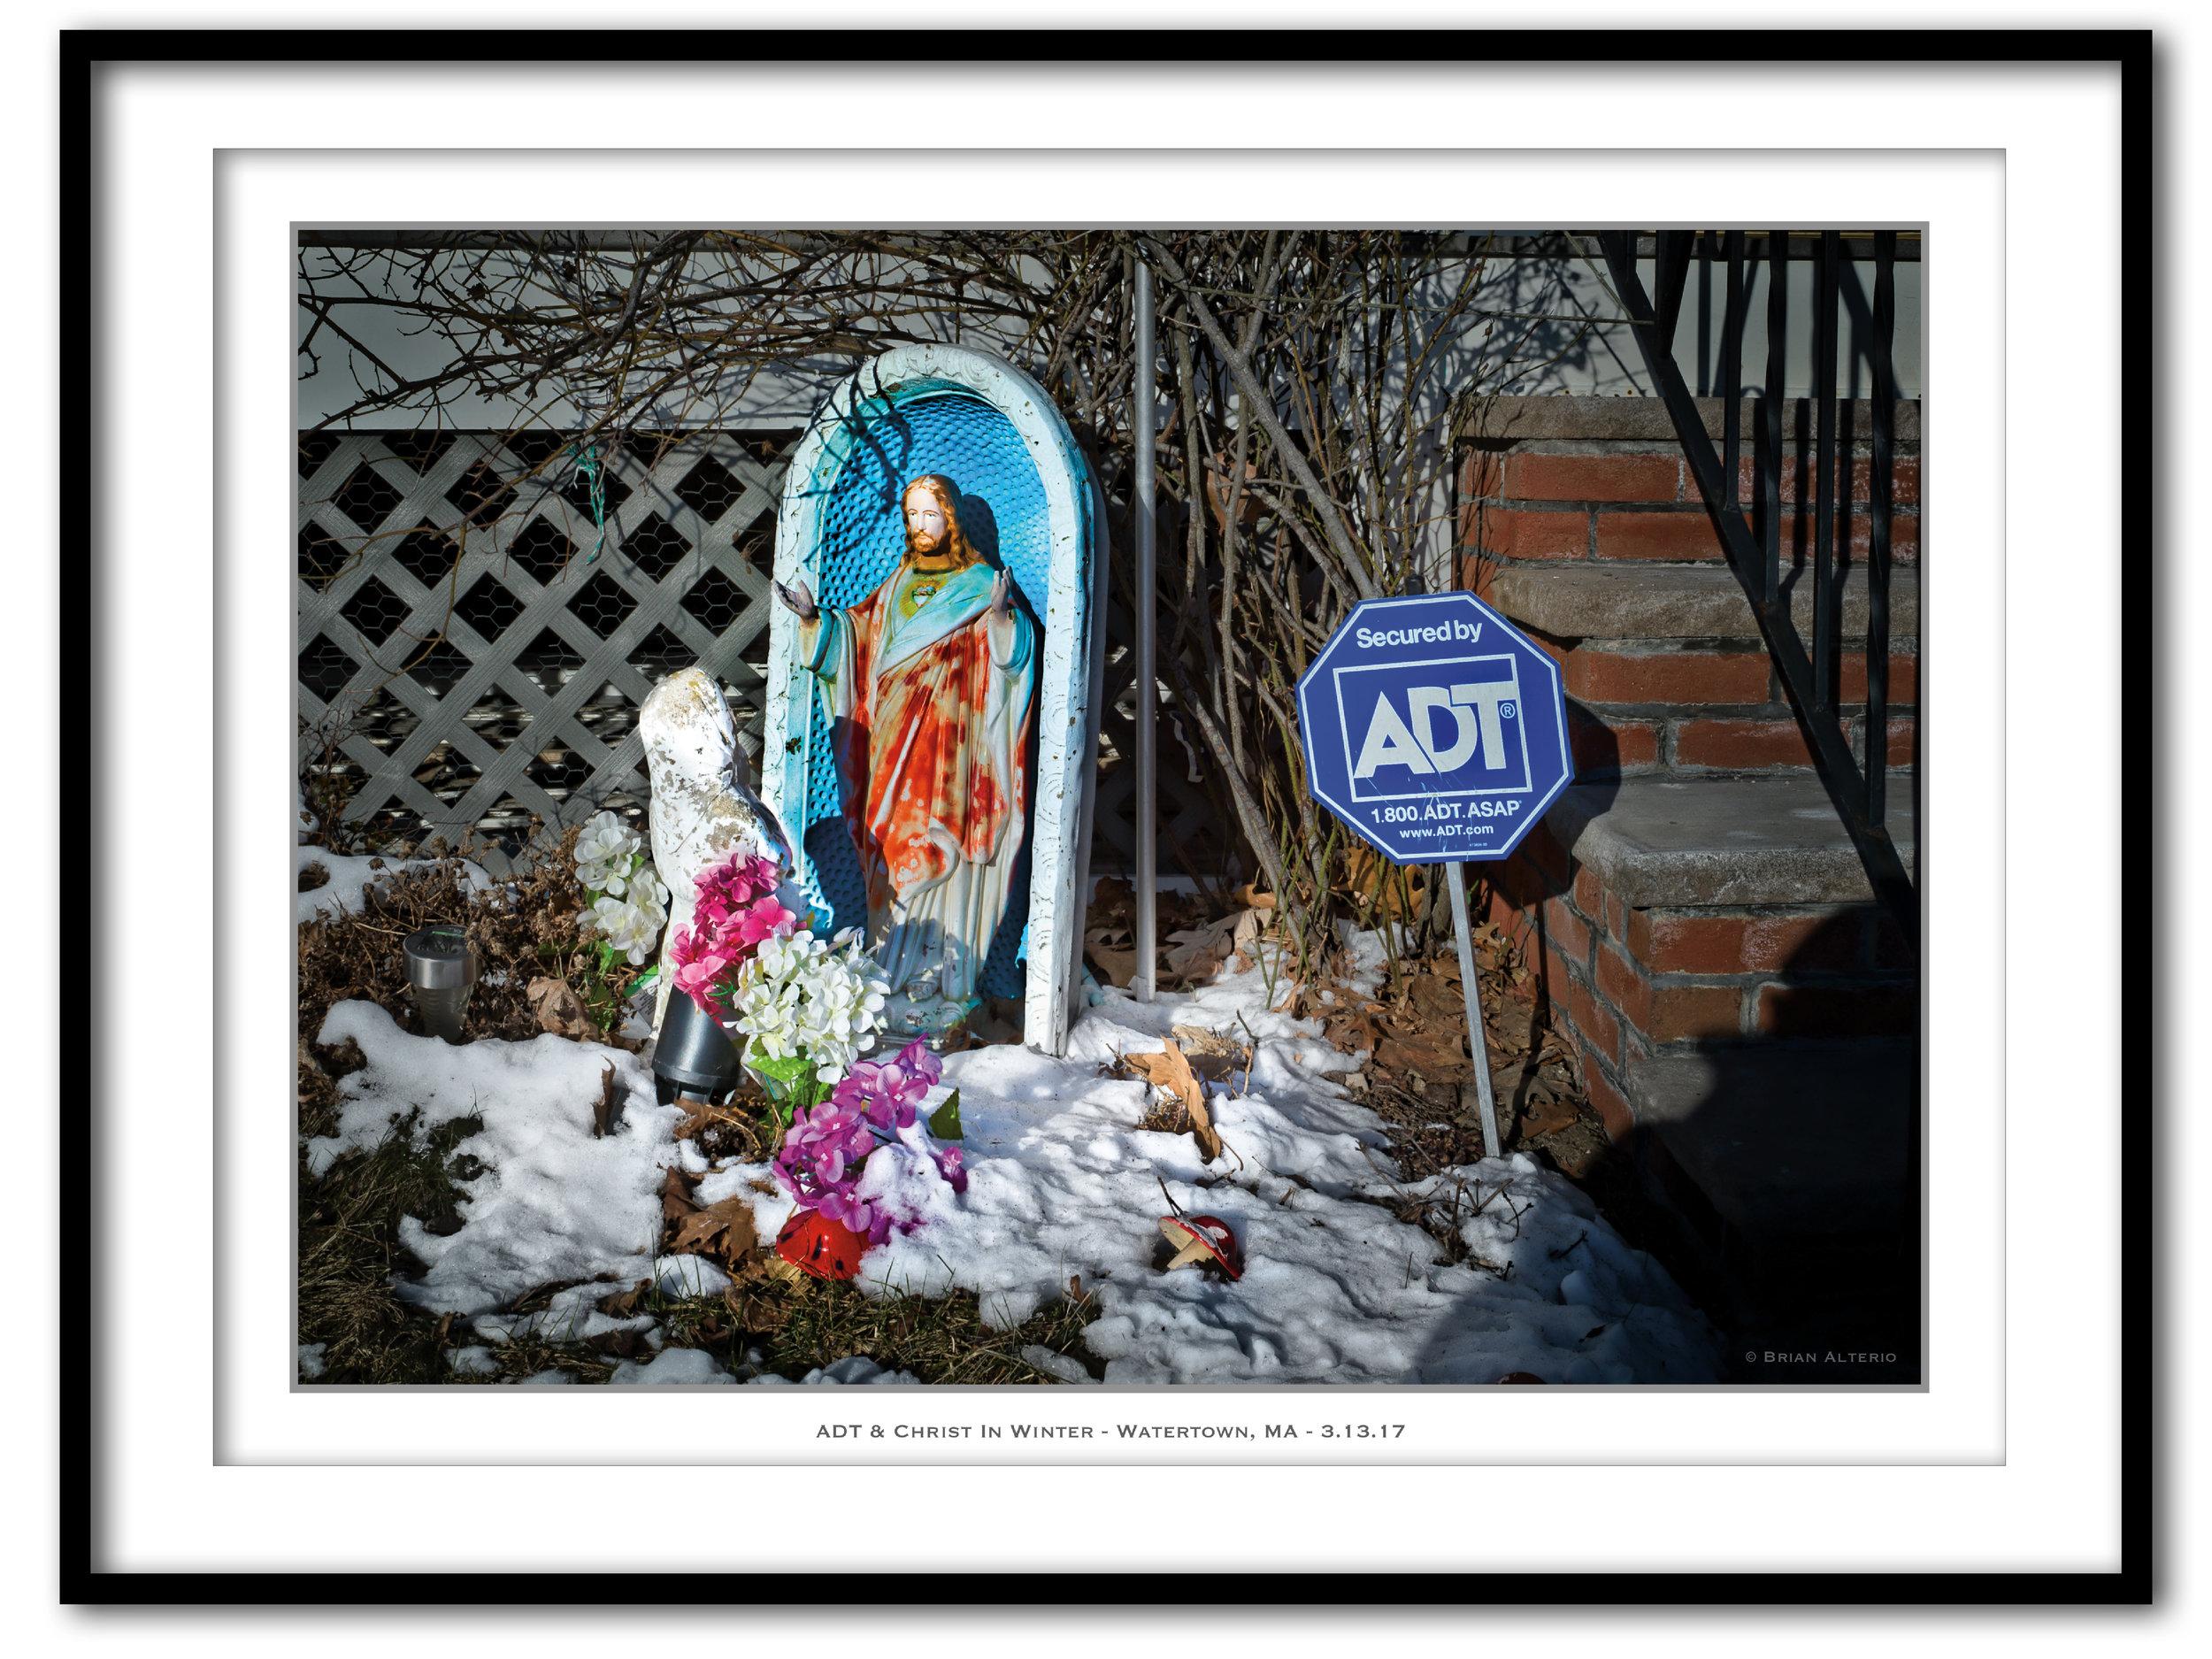 ADT & Christ In Winter - Watertown, MA - 3.13.17 - Framed.jpg